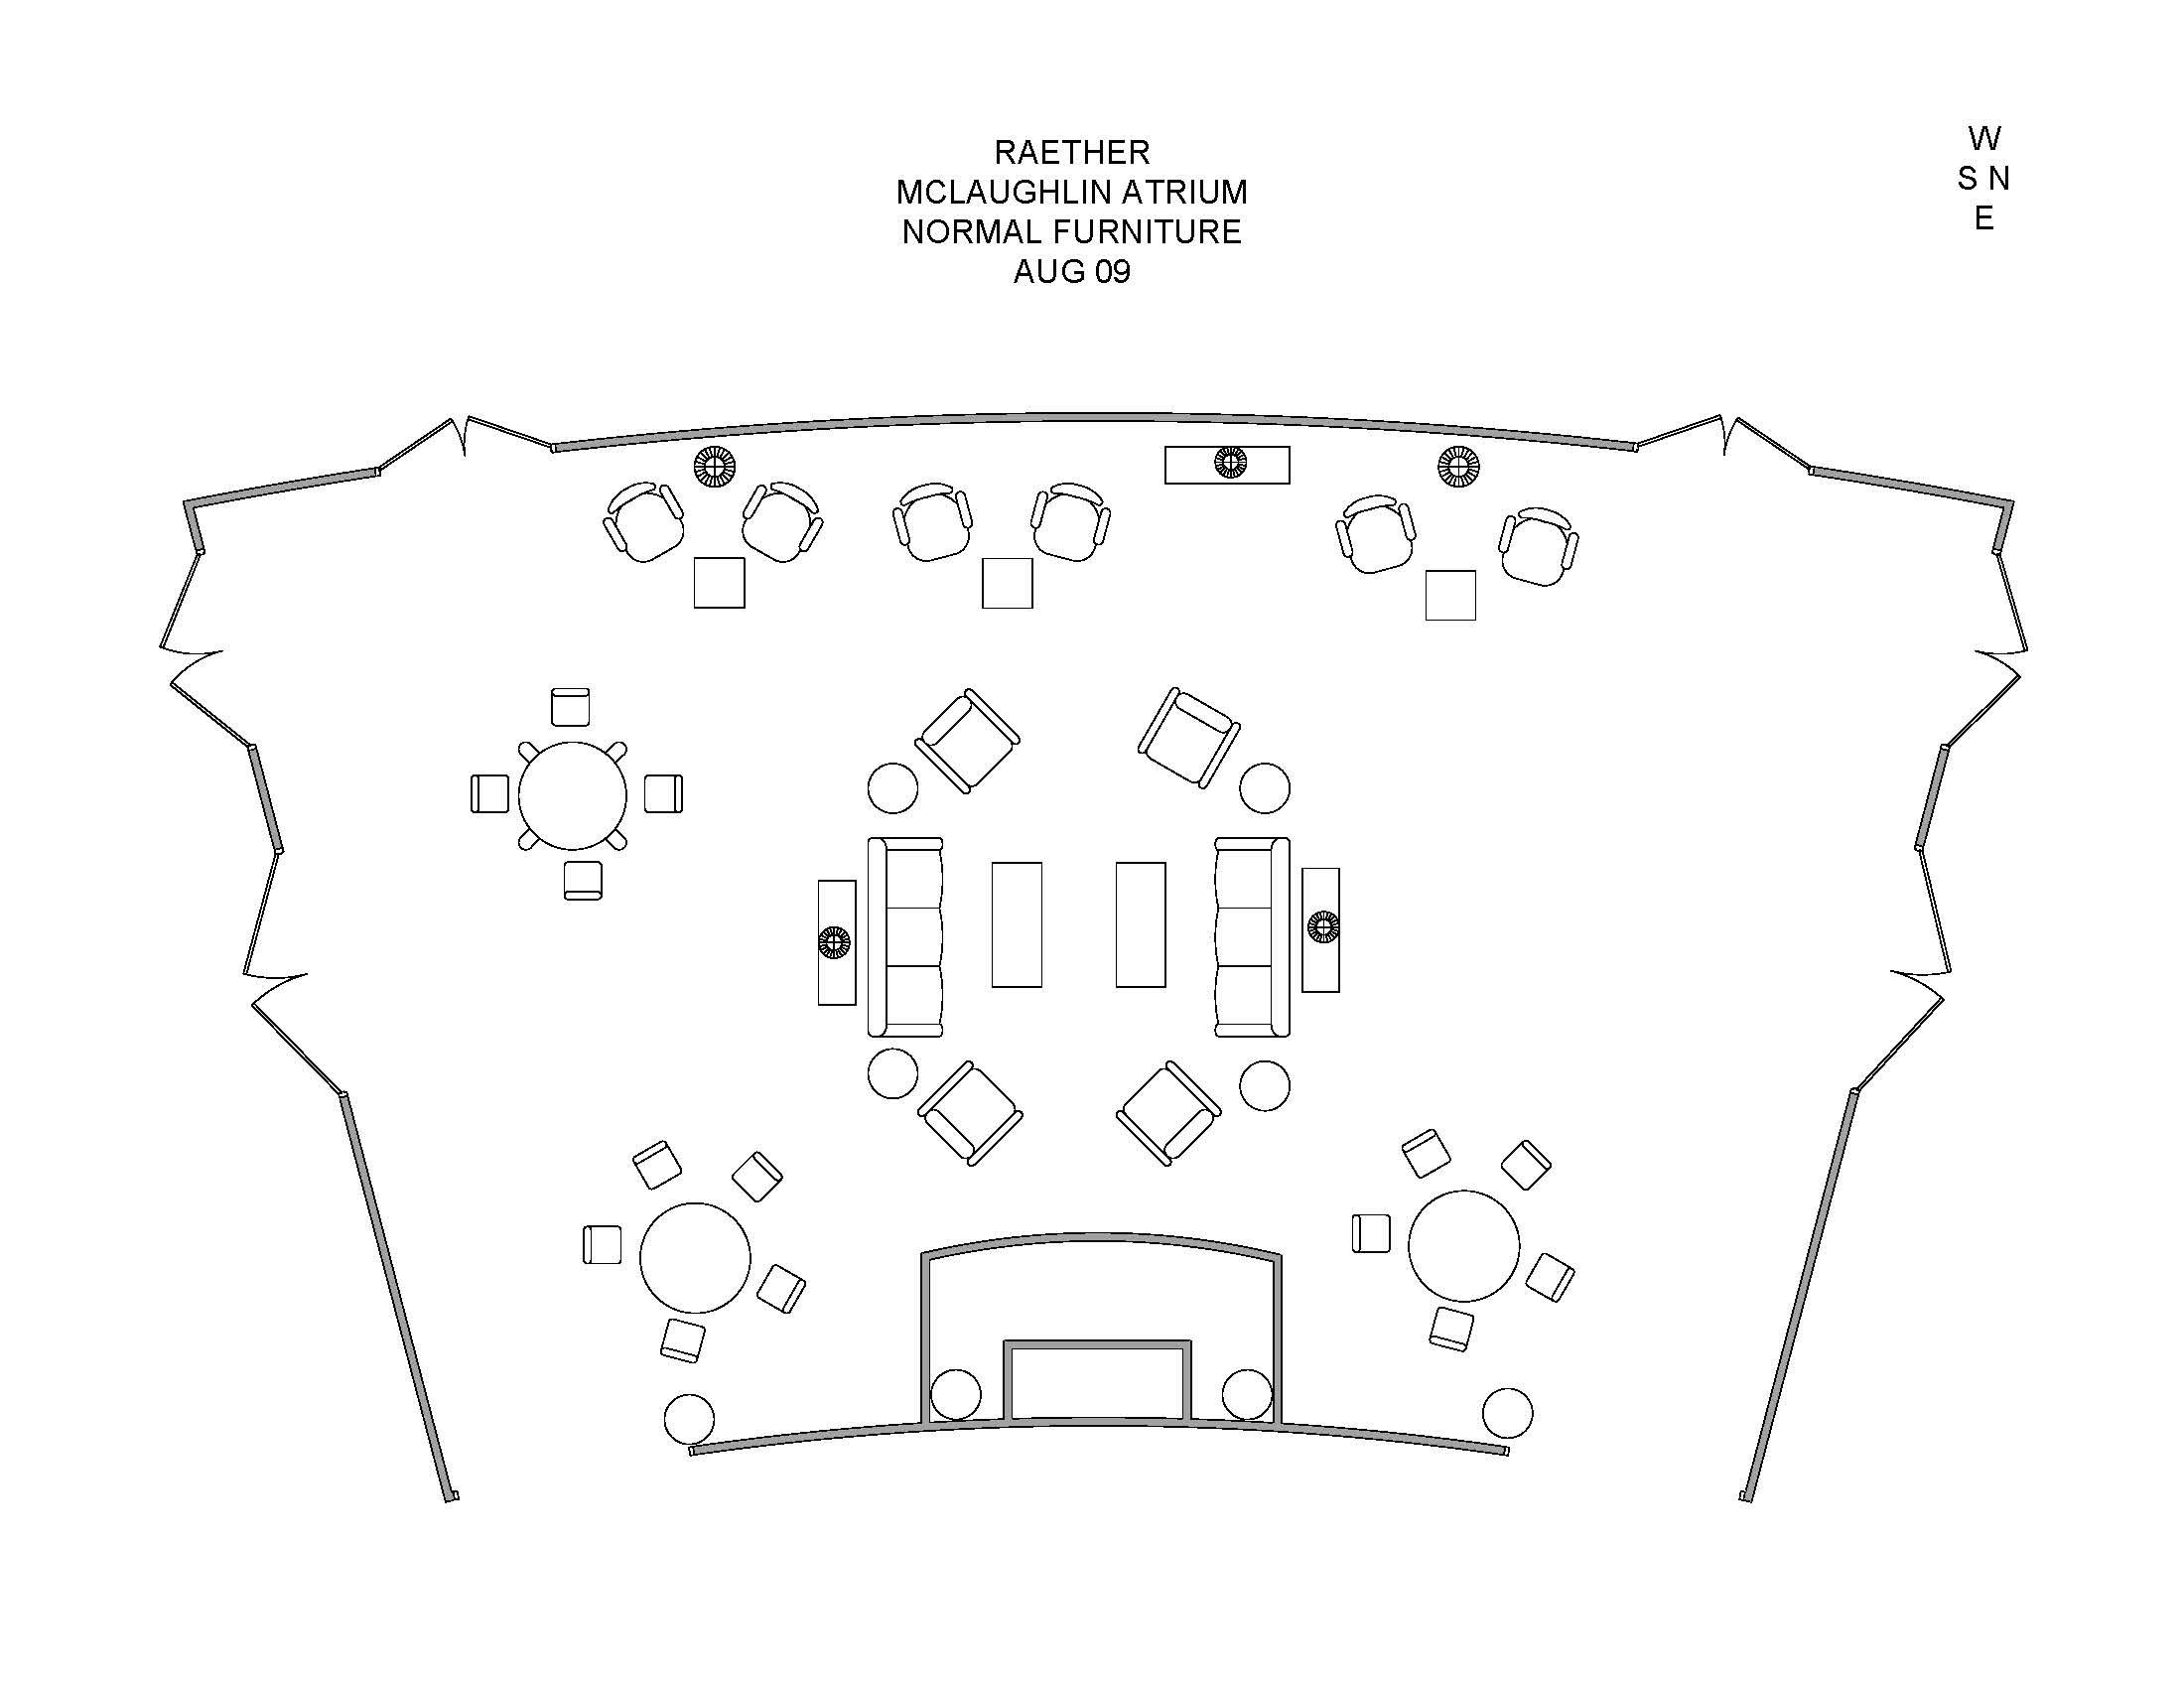 tuck events  u0026 facilities    raether mclaughlin atrium diagrams